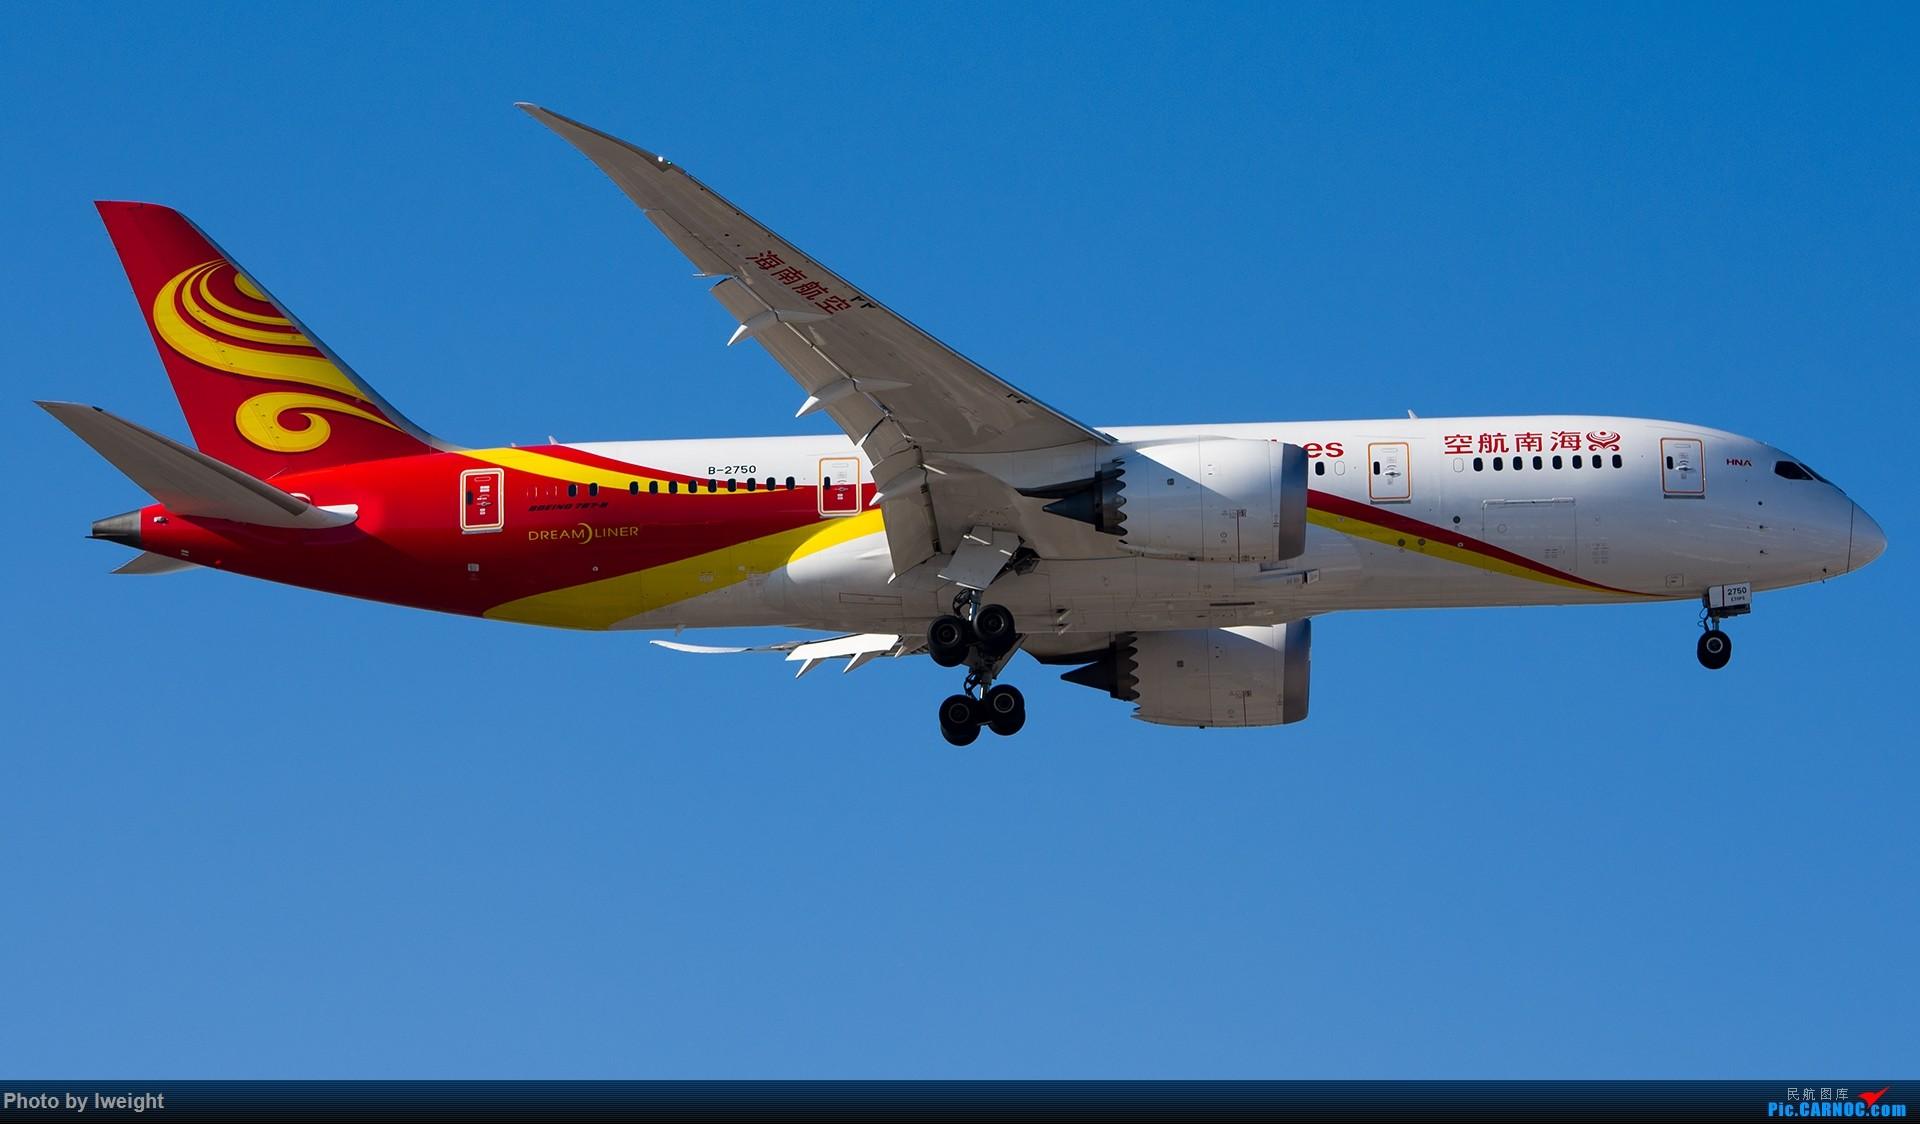 Re:[原创]终于在12月的北京等到了一个晴天的周末,出来拍拍飞机【2015-12-5】 BOEING 787-8 B-2750 中国北京首都国际机场